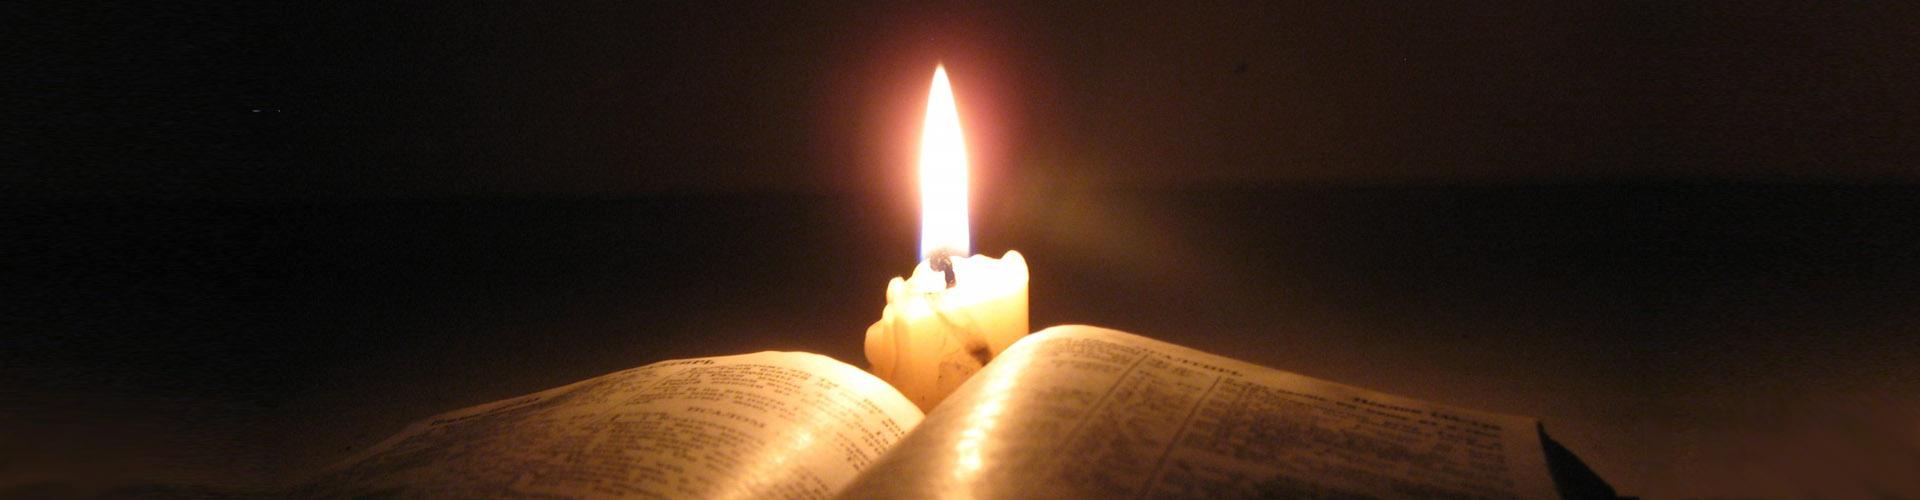 liturgia-1.jpg